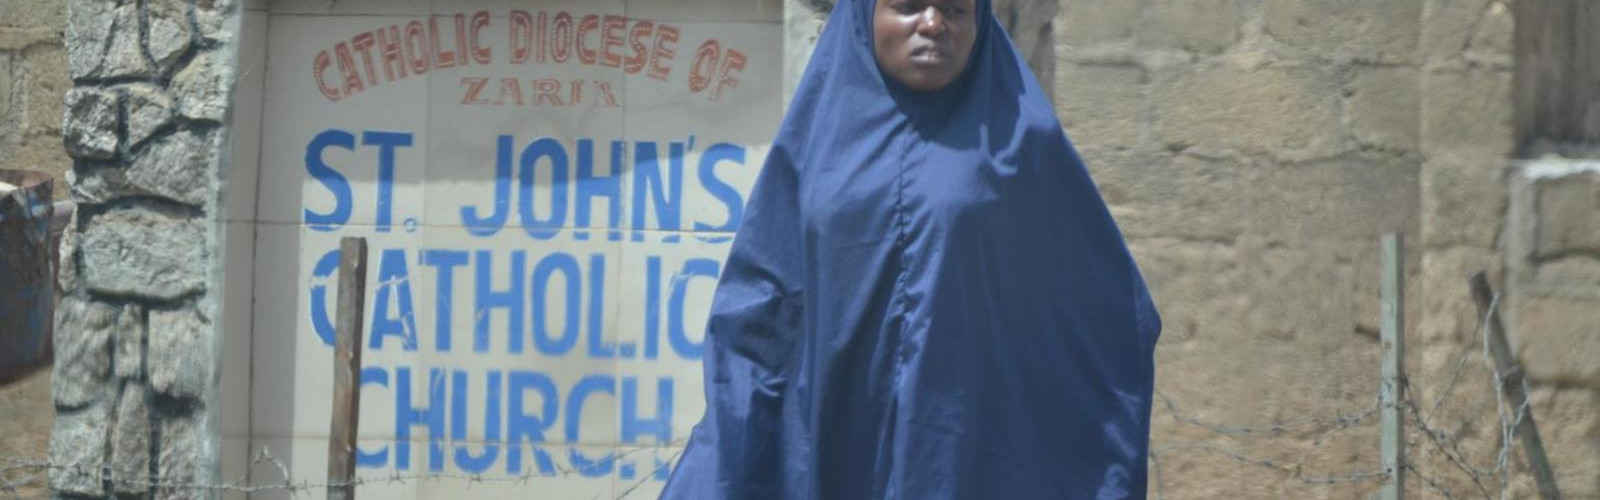 ACN Zaria moslim bij katholieke Kerk